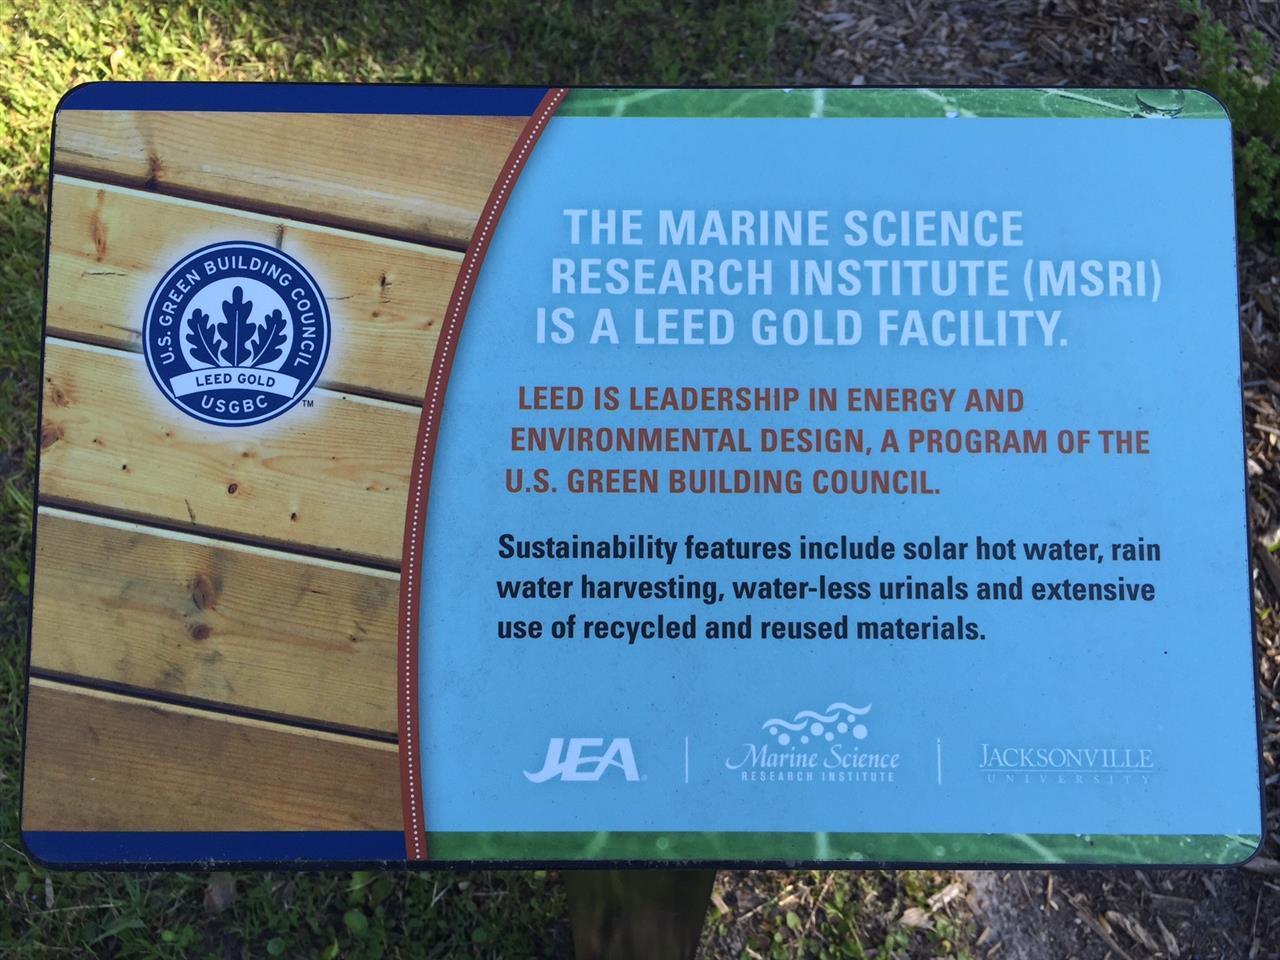 #JacksonvilleFL #JacksonvilleUniversity #MarineScience